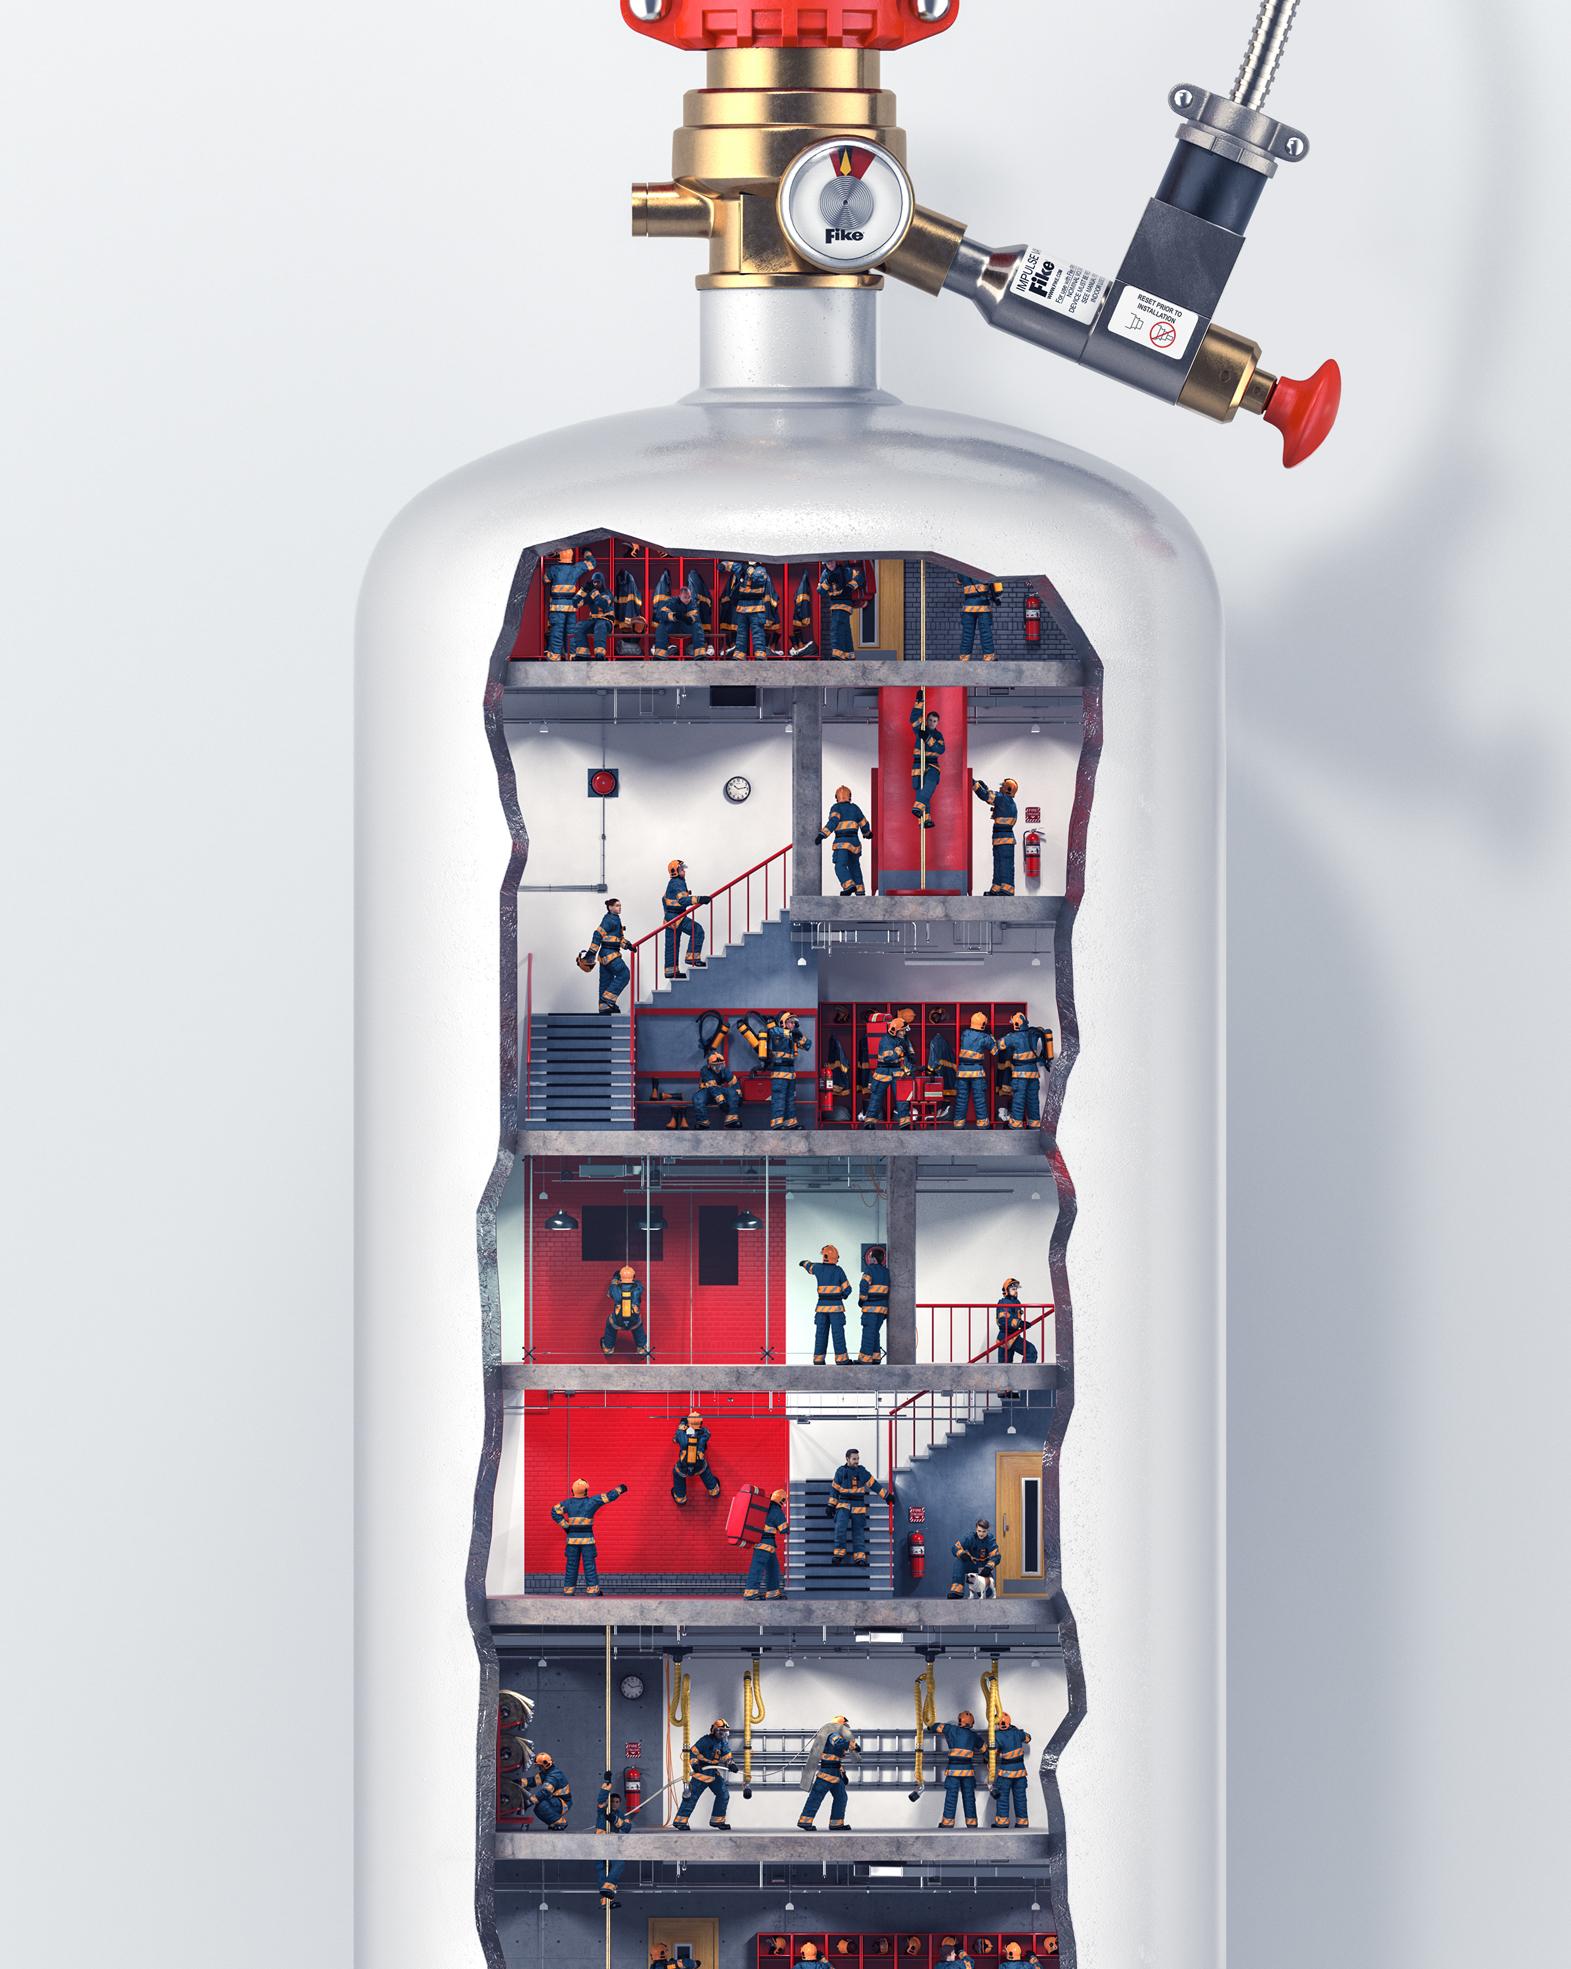 Extinguisher_Fire_Station.jpg